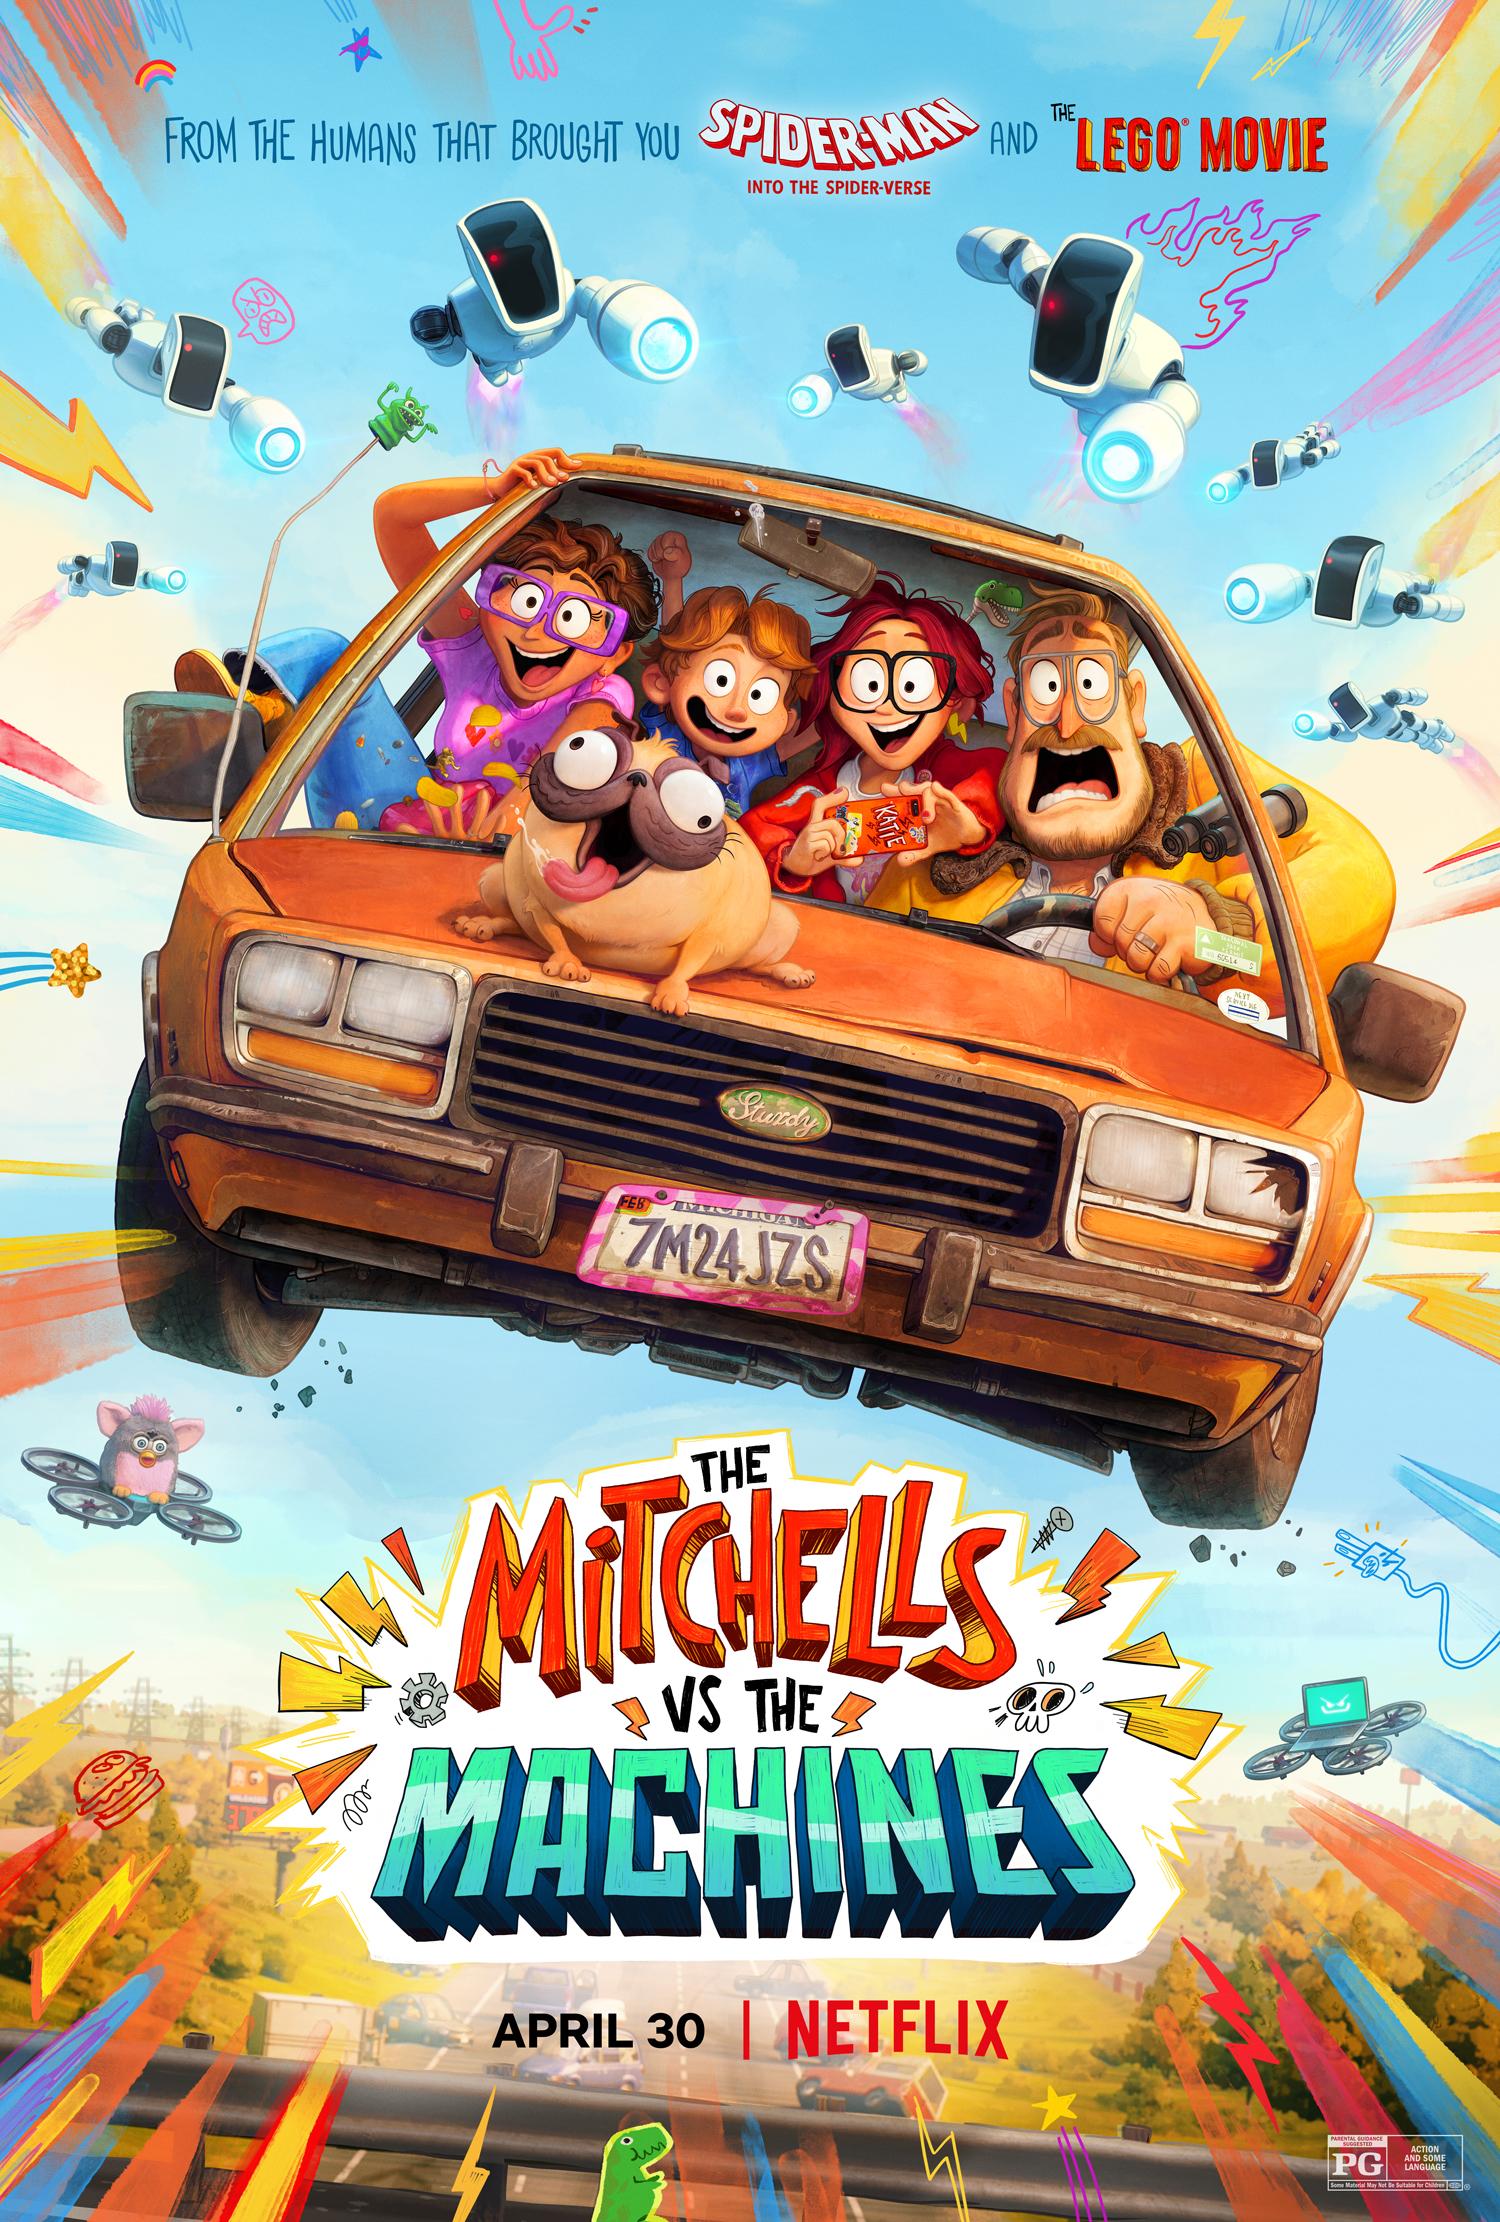 New Movie: Netflix's The Mitchells Vs The Machines